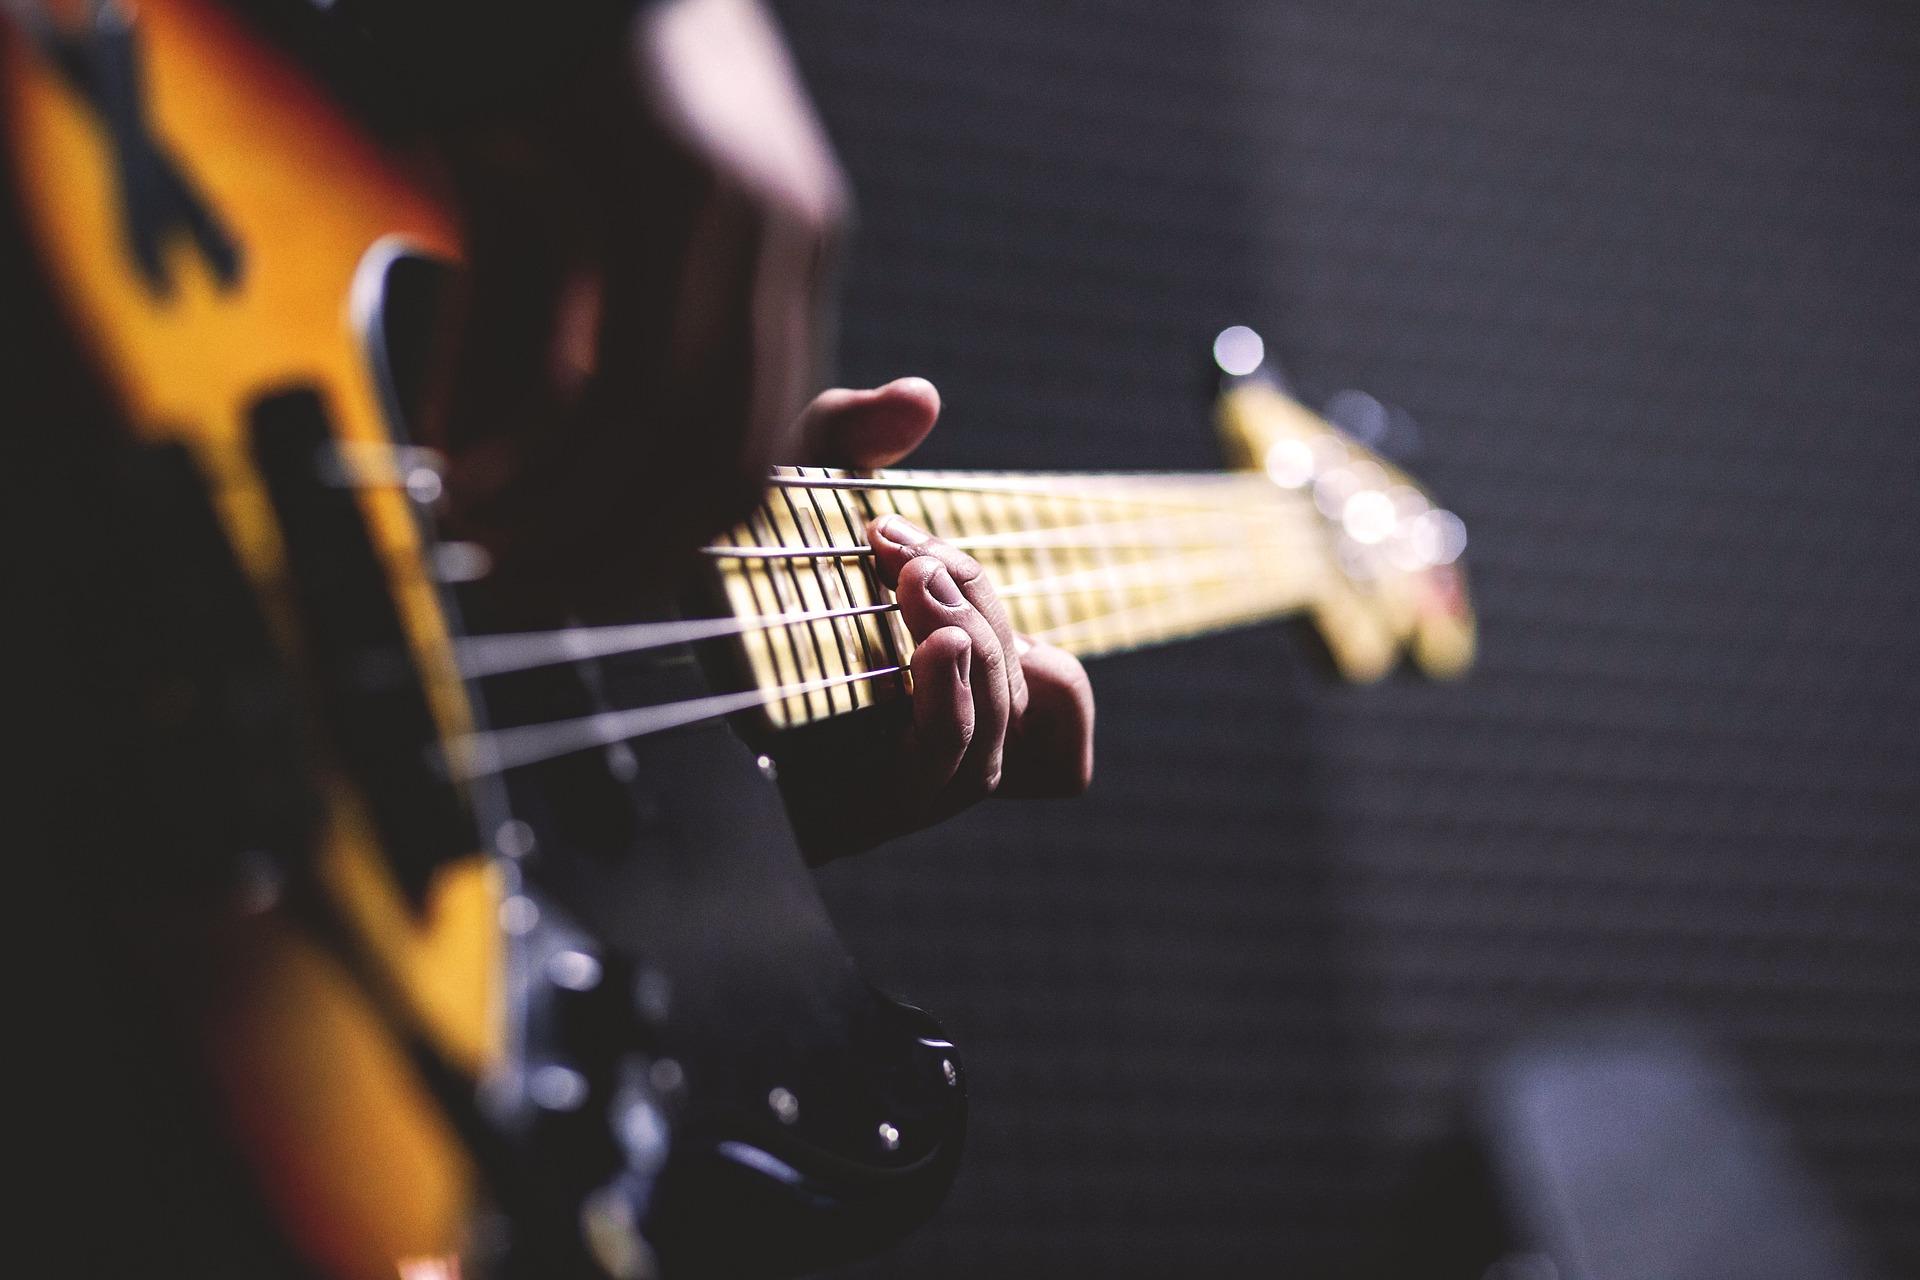 Man Playing Bass Barrett School of Music Tampa